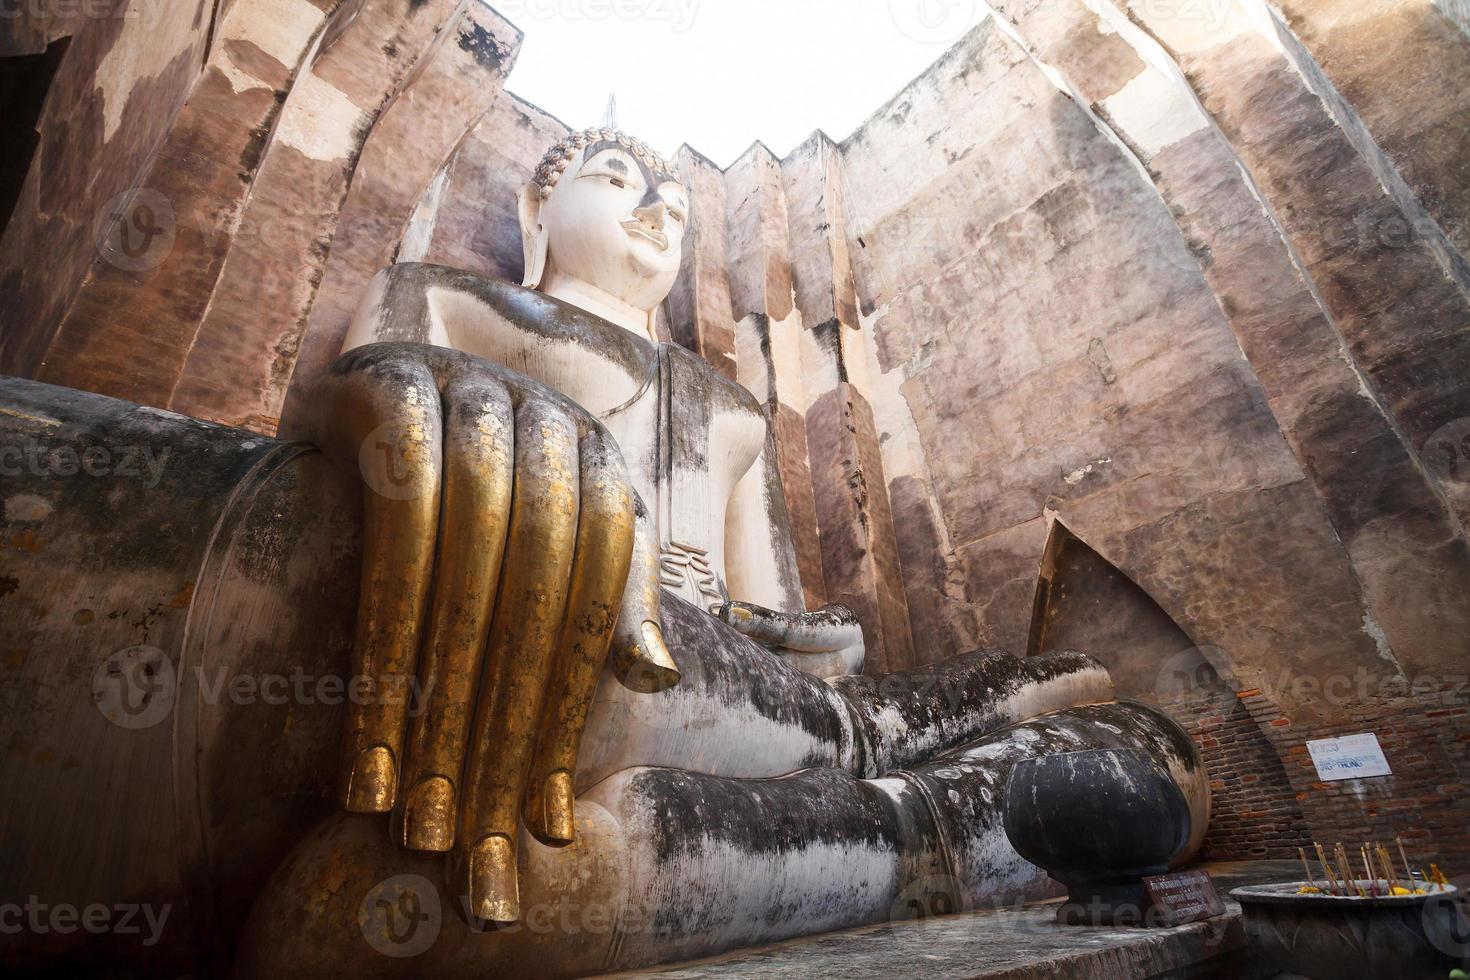 antica statua di buddha. Parco storico di Sukhothai, Tailandia foto